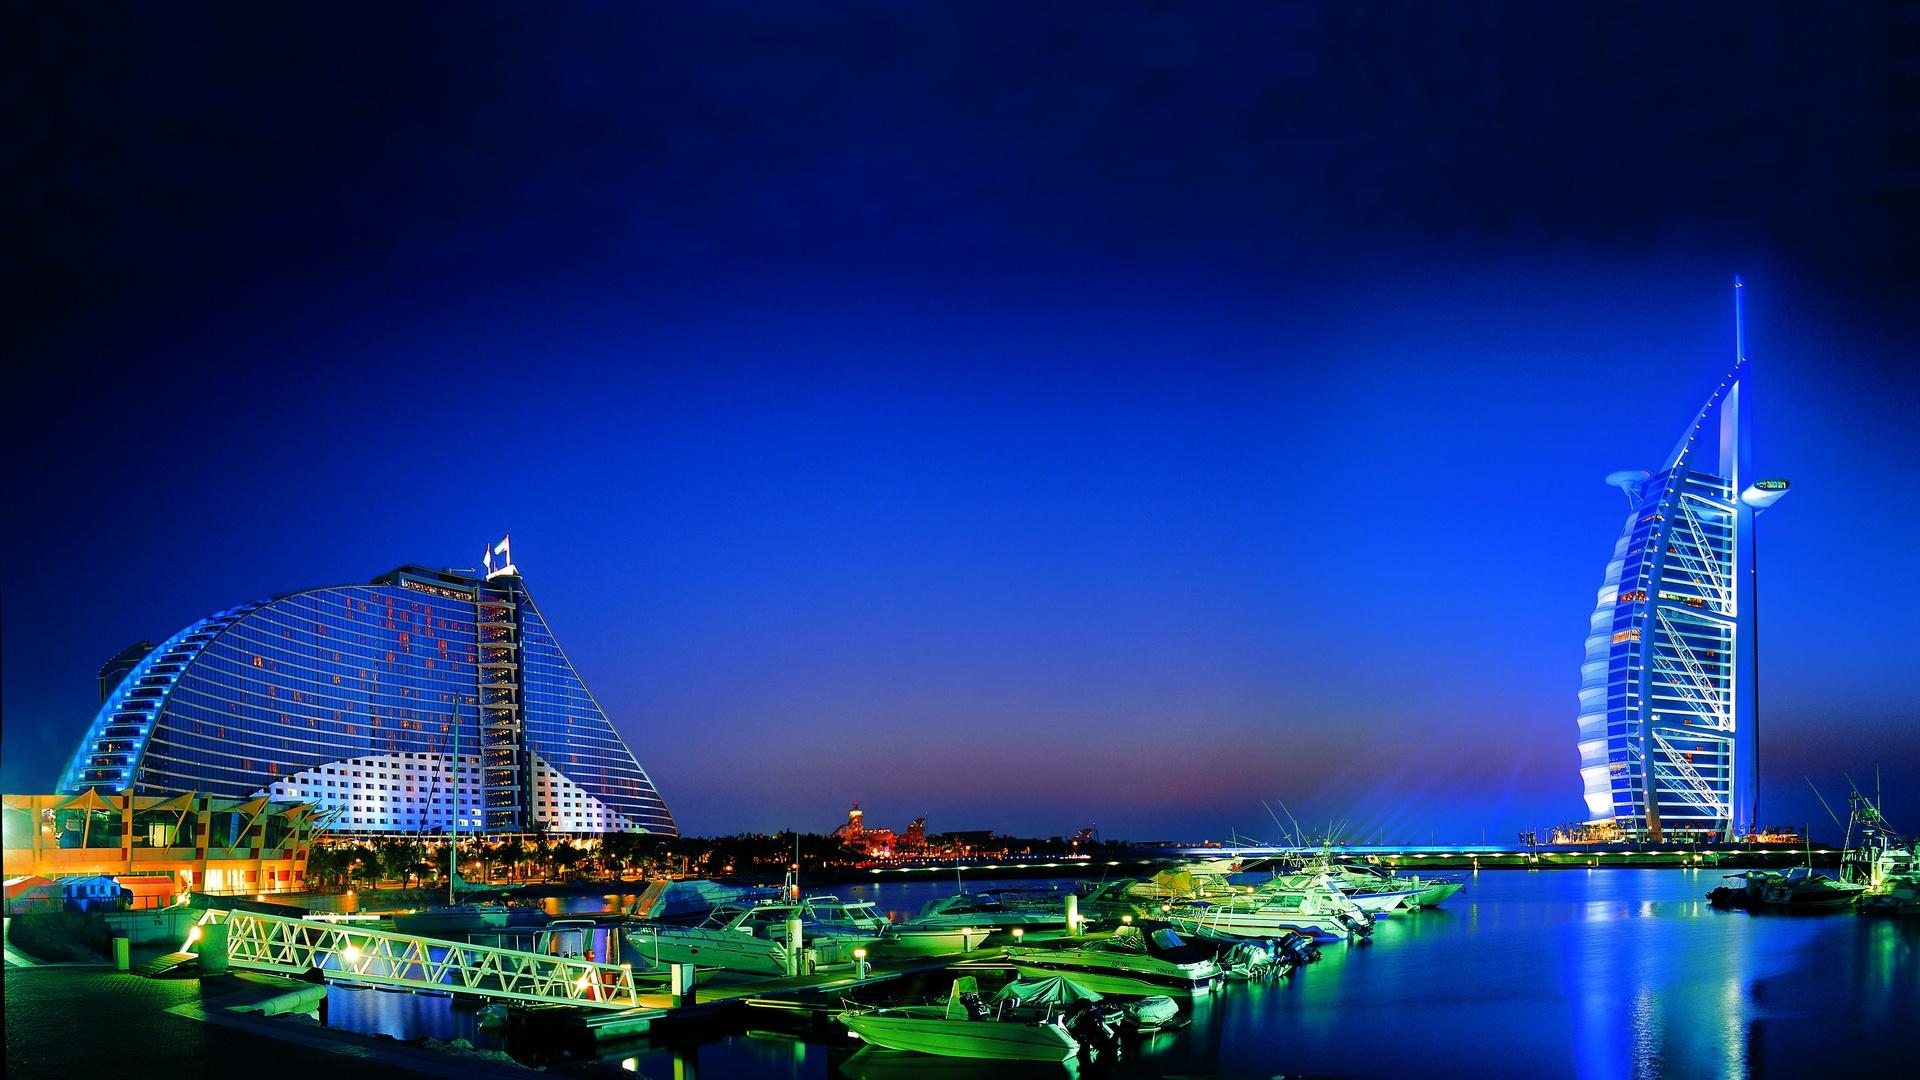 Dubai wallpaper photo full hd